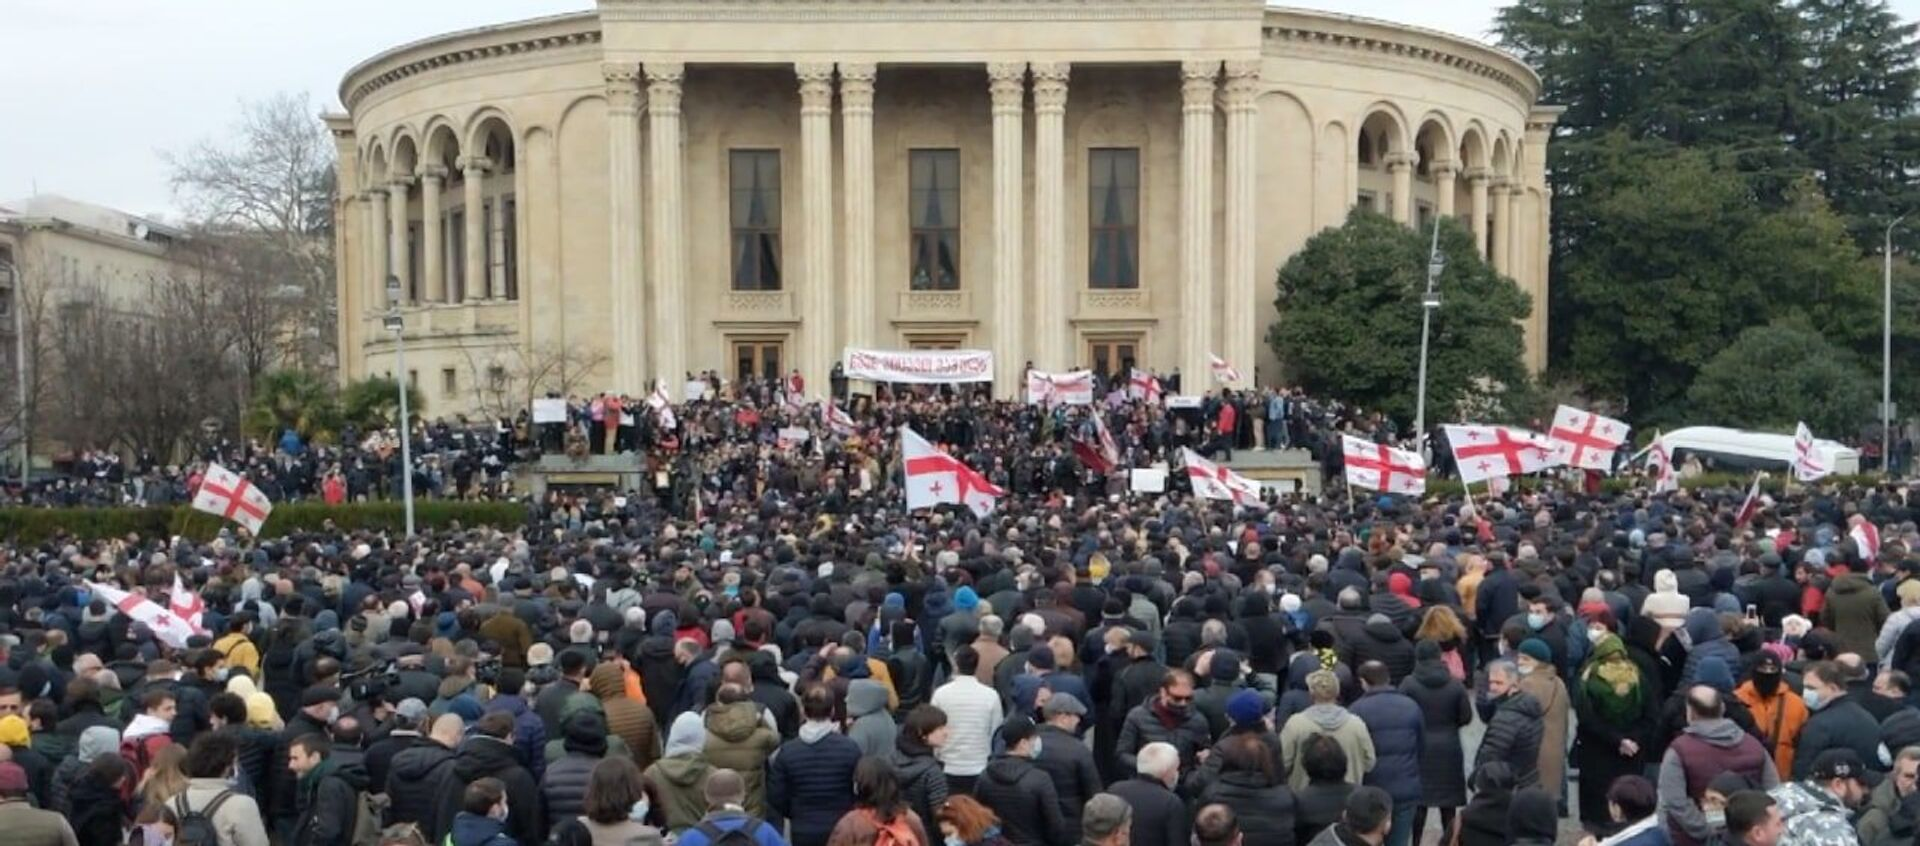 В центре Кутаиси прошла акция протеста против строительства Намахвани ГЭС - видео - Sputnik Грузия, 1920, 28.02.2021